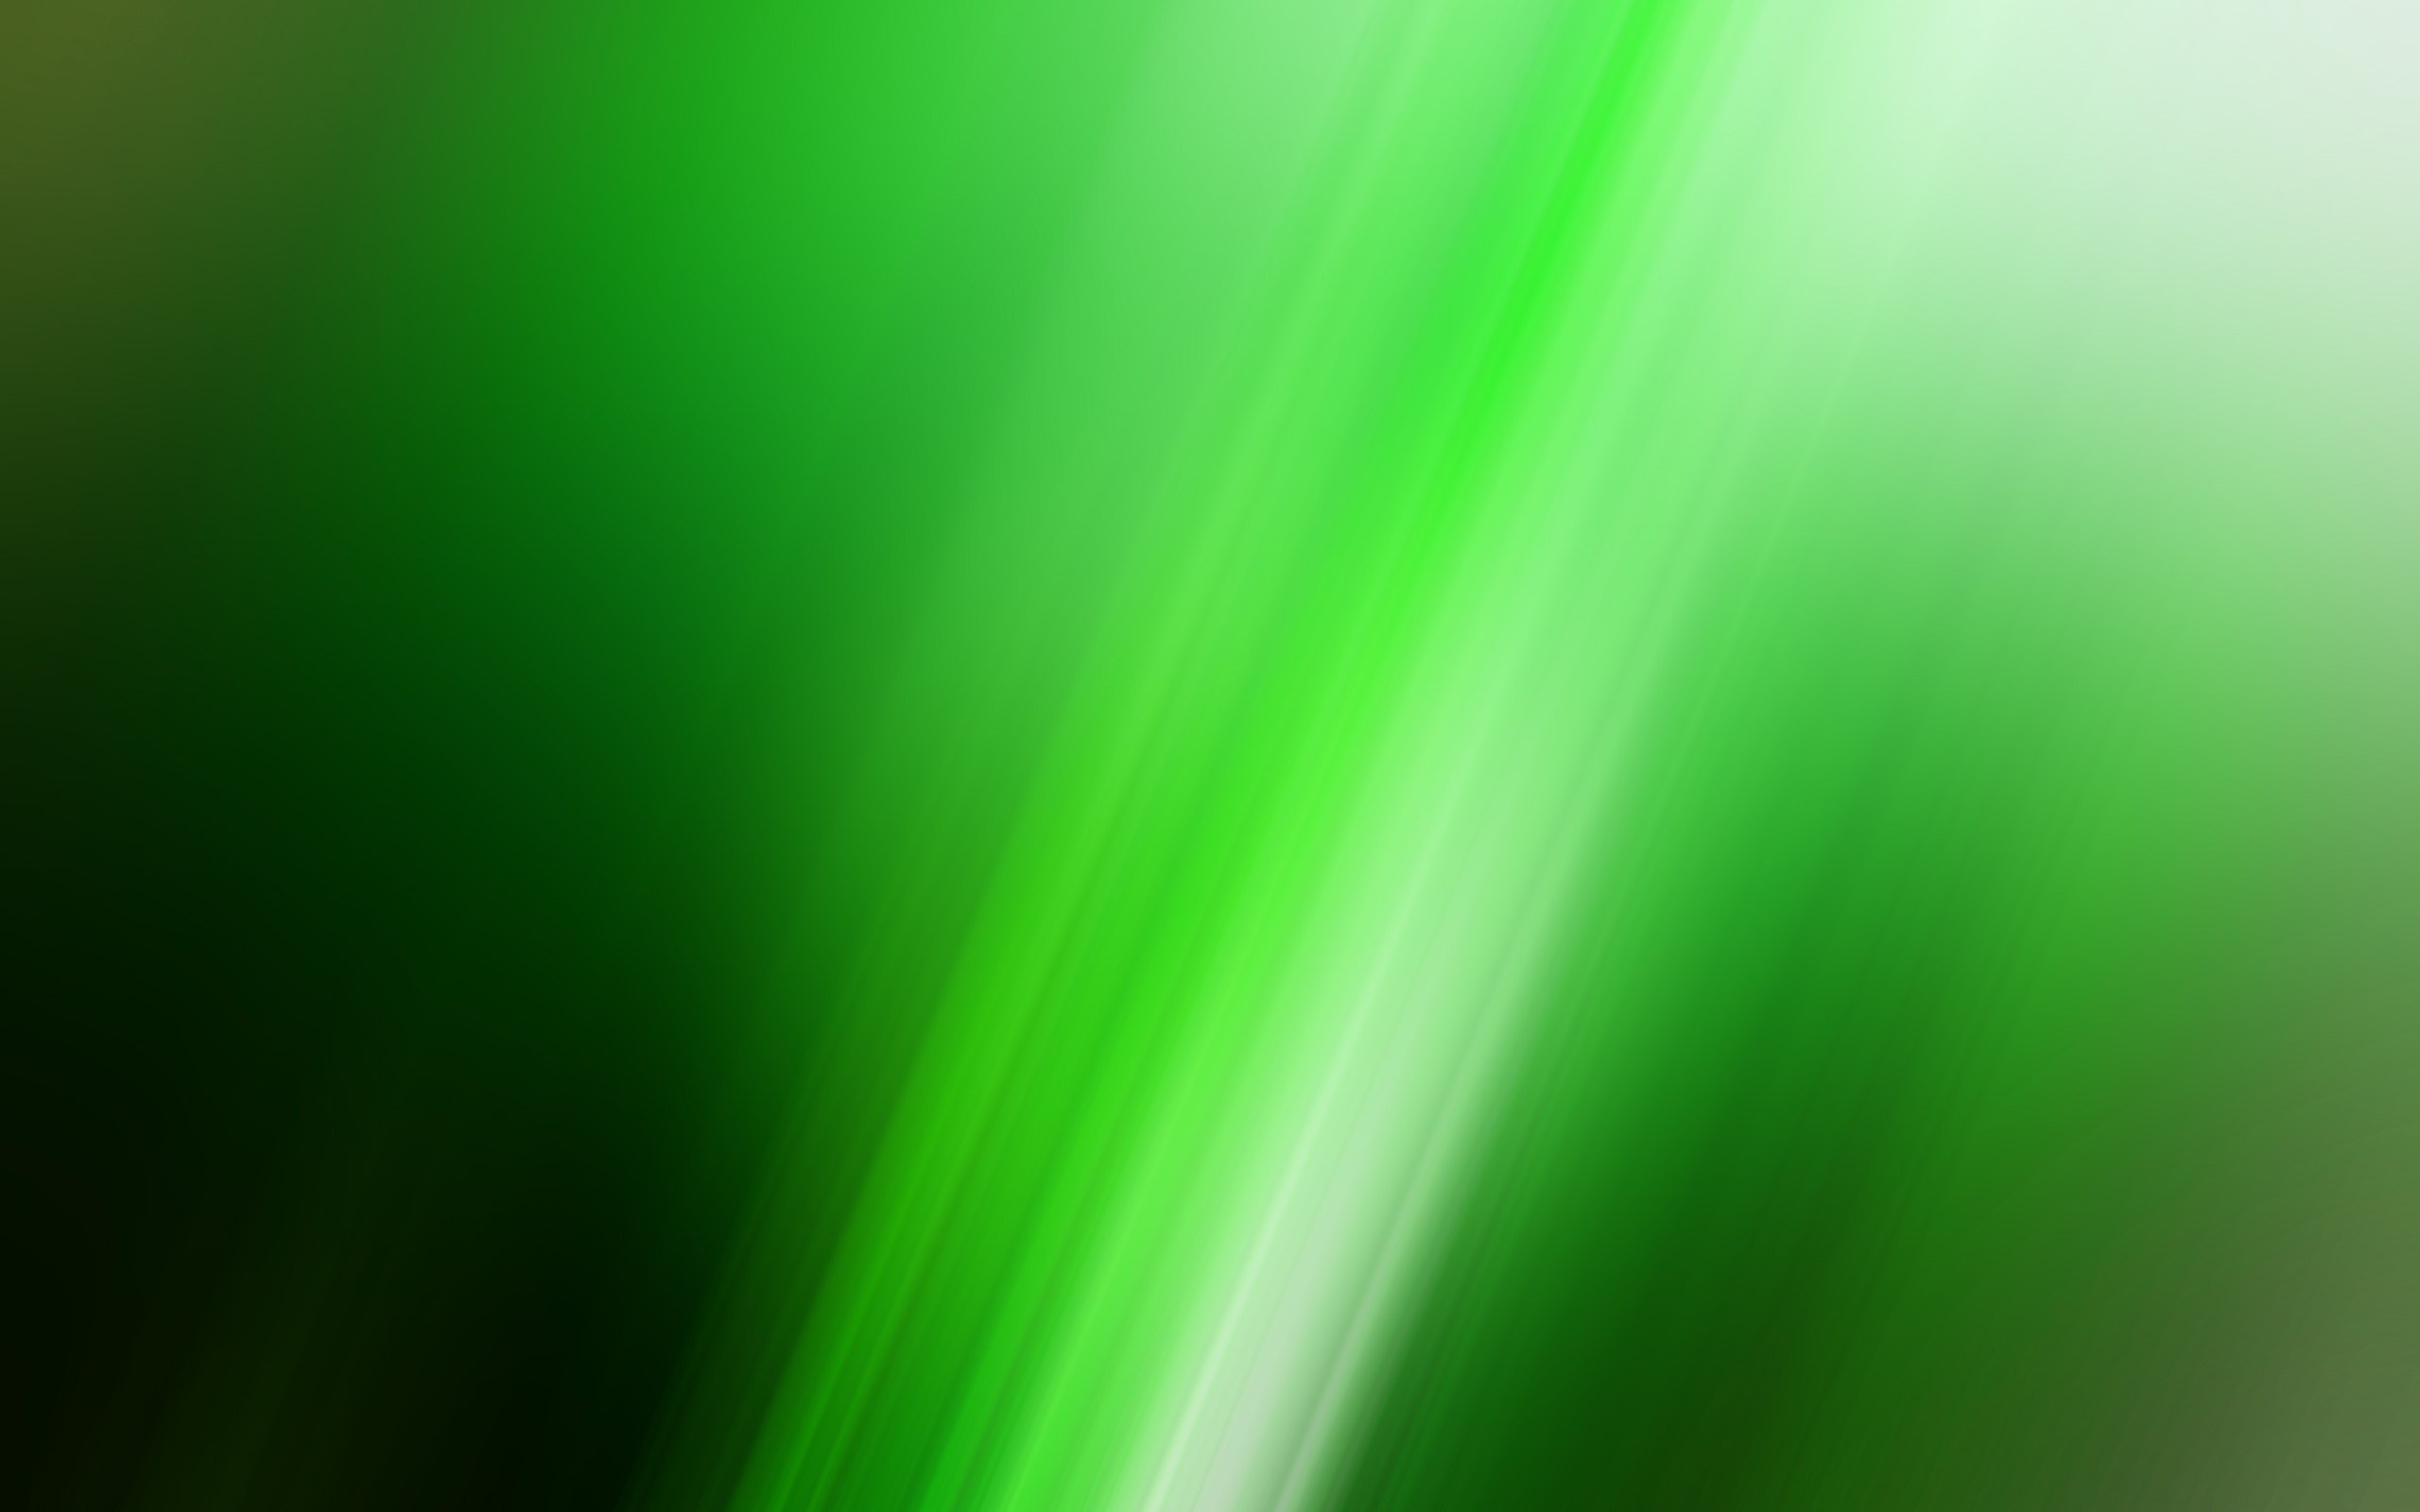 green color wallpaper wallpapersafari. Black Bedroom Furniture Sets. Home Design Ideas